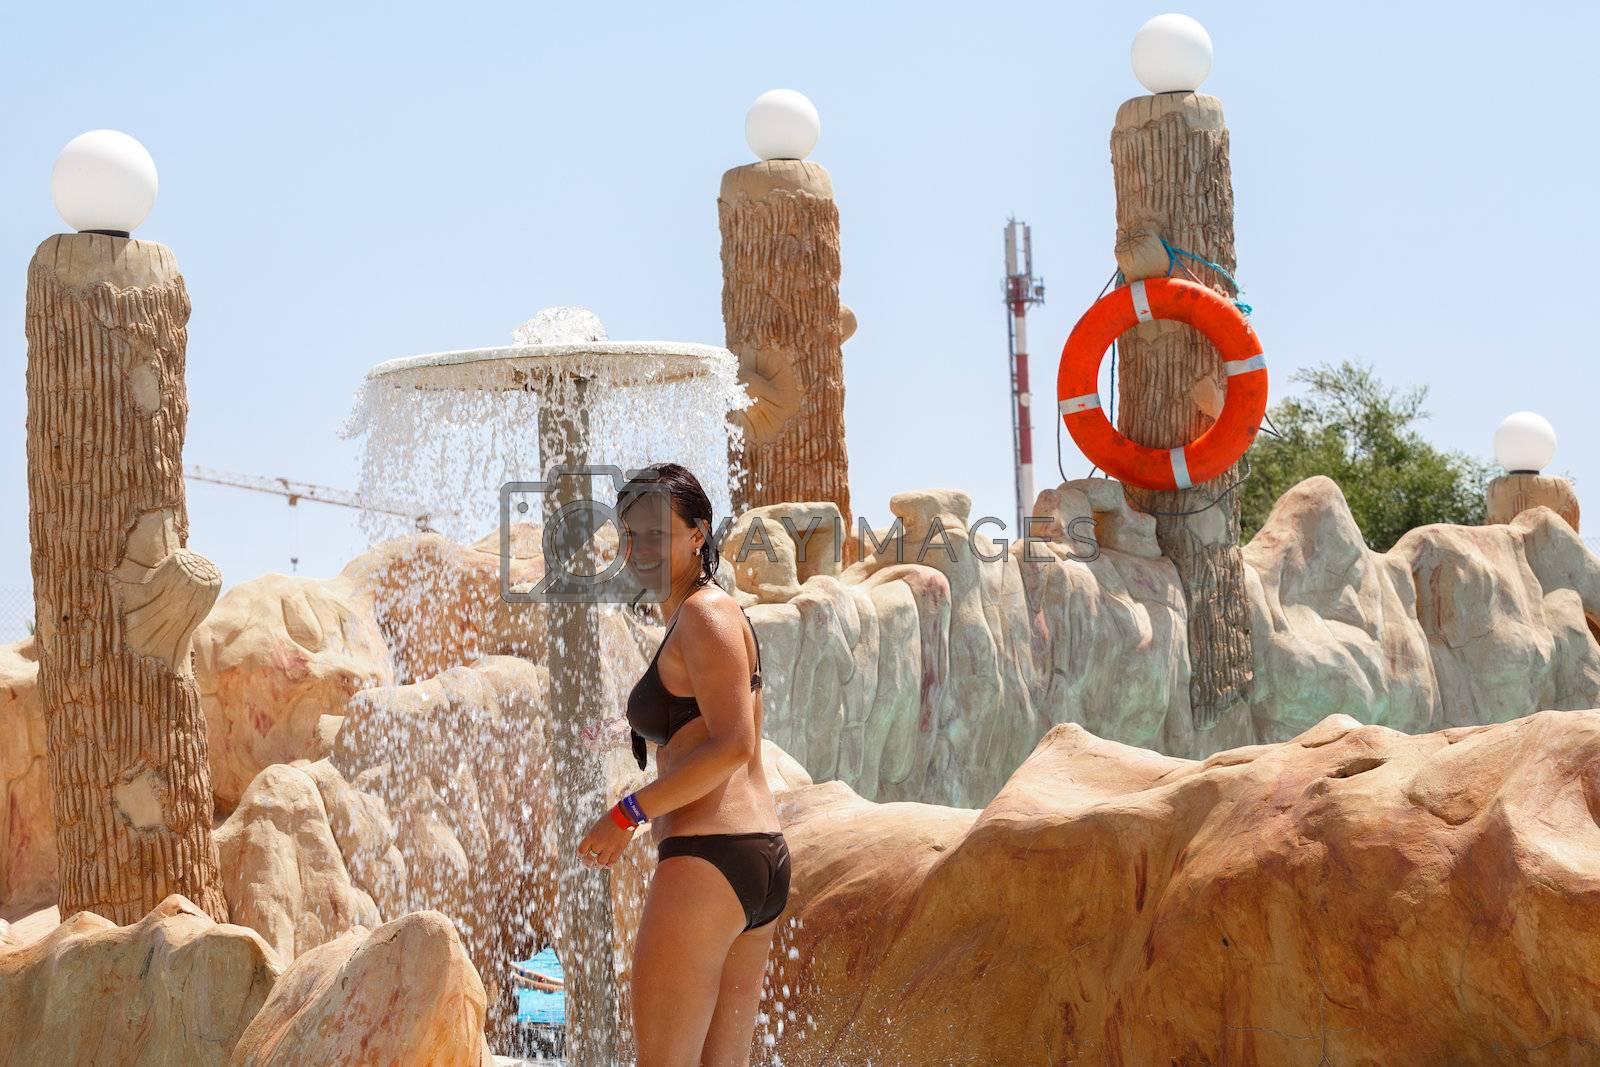 Royalty free image of woman in tunisian aquapark resort under shower by artush